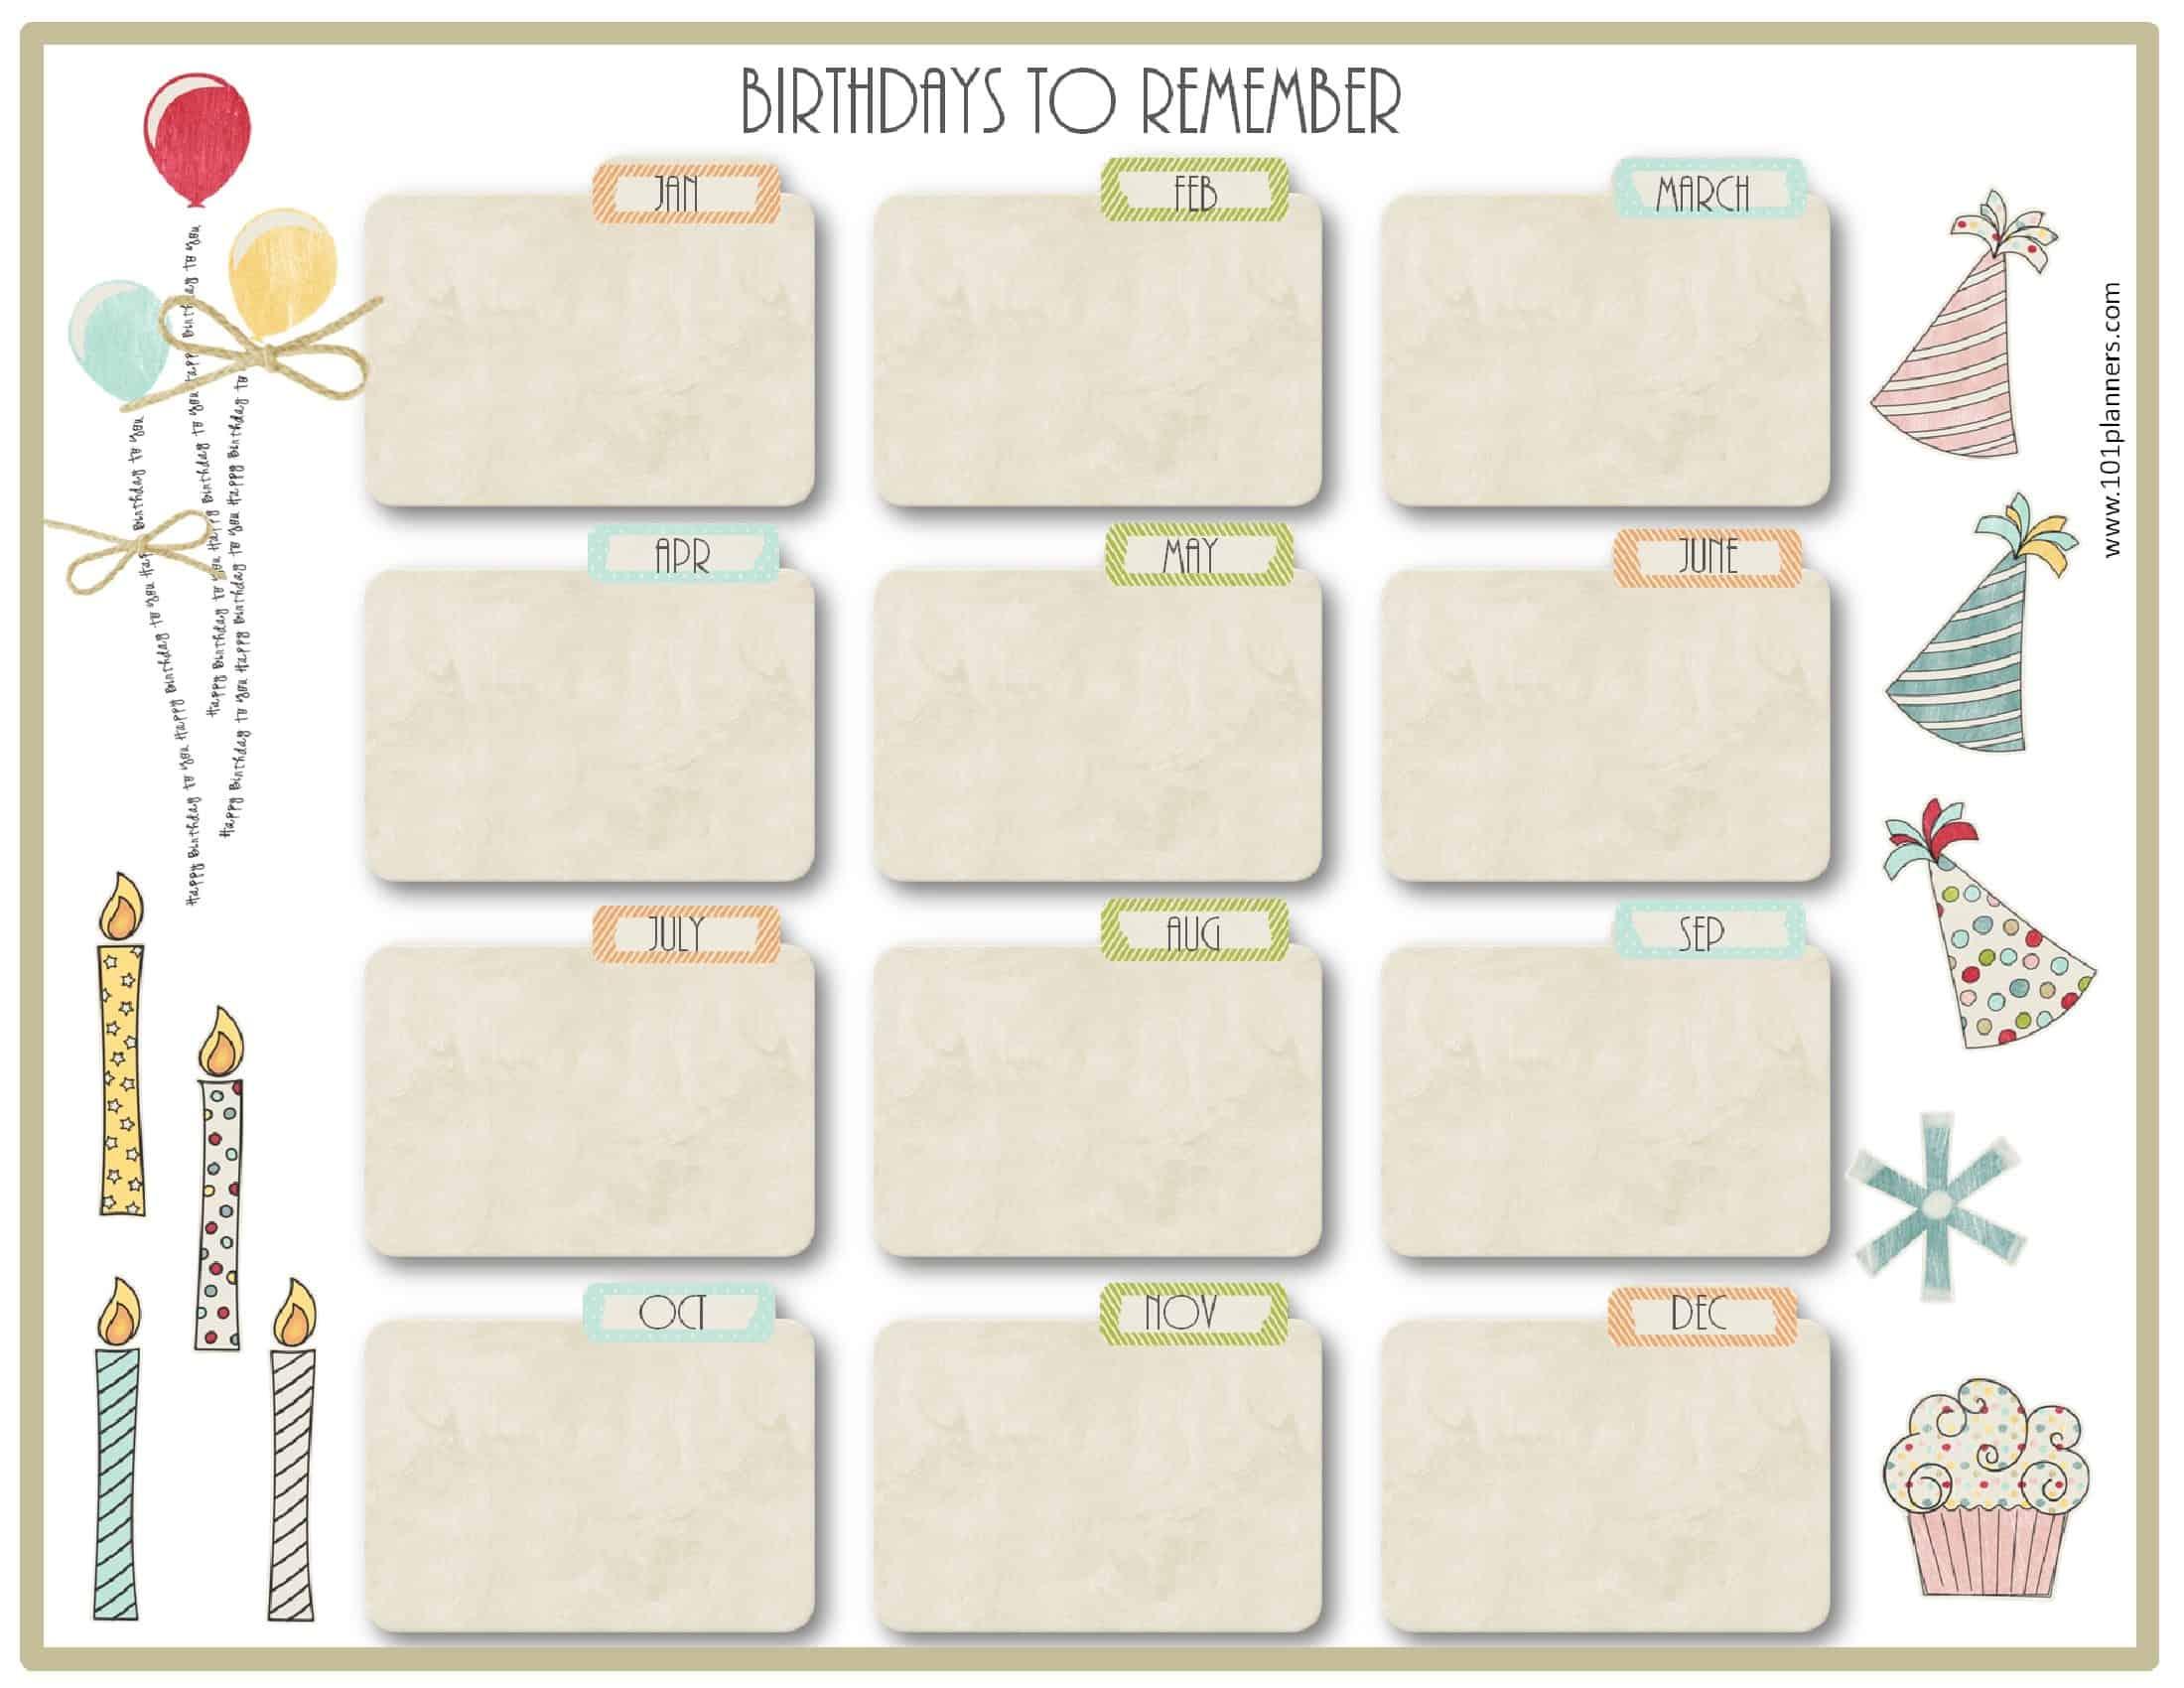 Free Birthday Calendar   Printable & Customizable   Many Designs! throughout Monthly Birthday Calendar Template